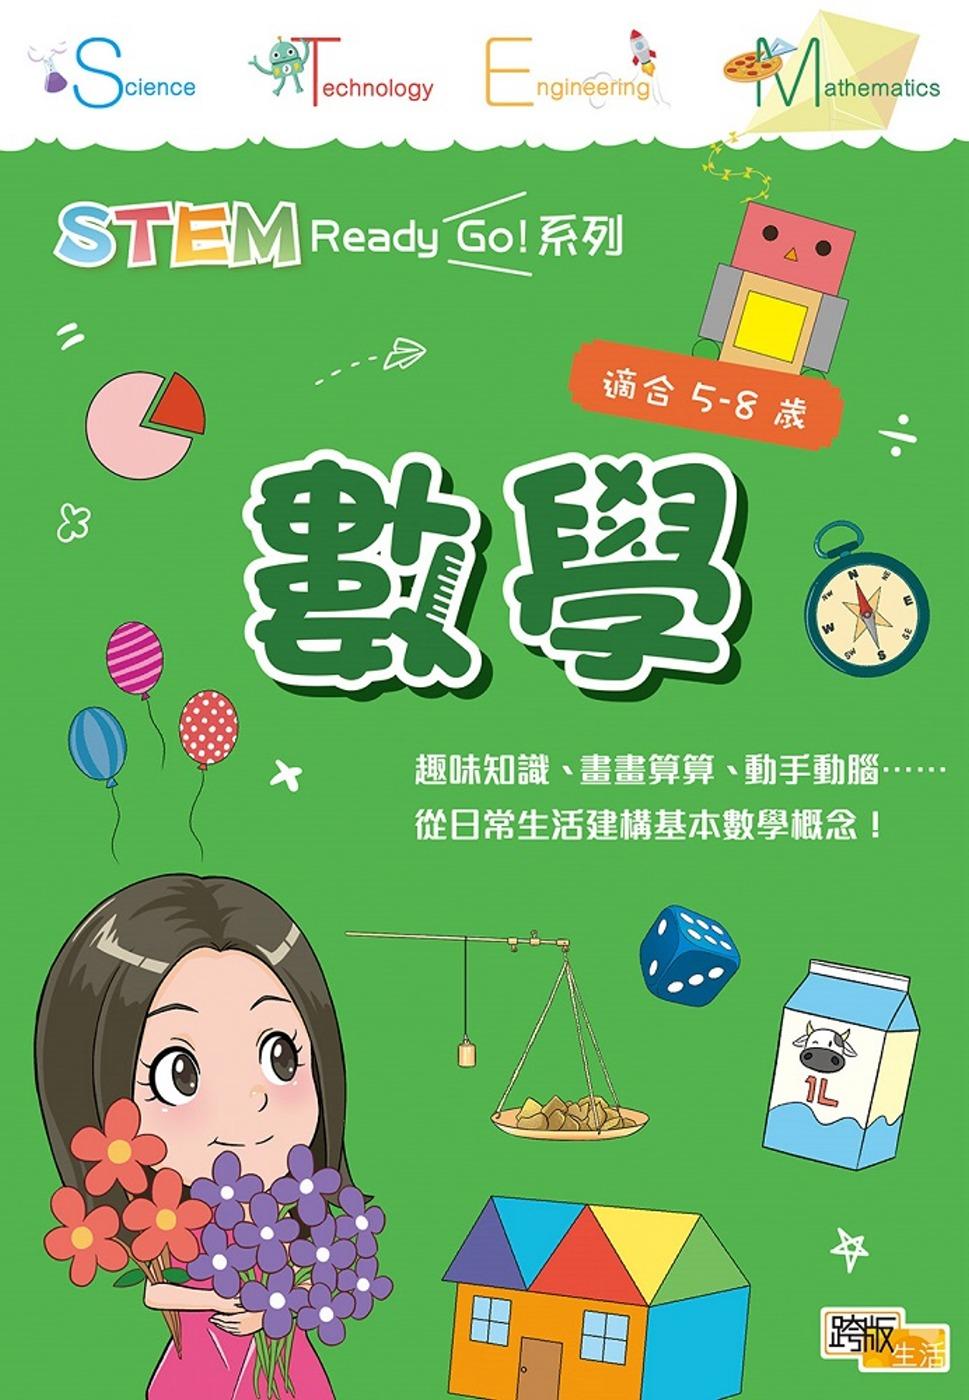 STEM Ready Go! ...